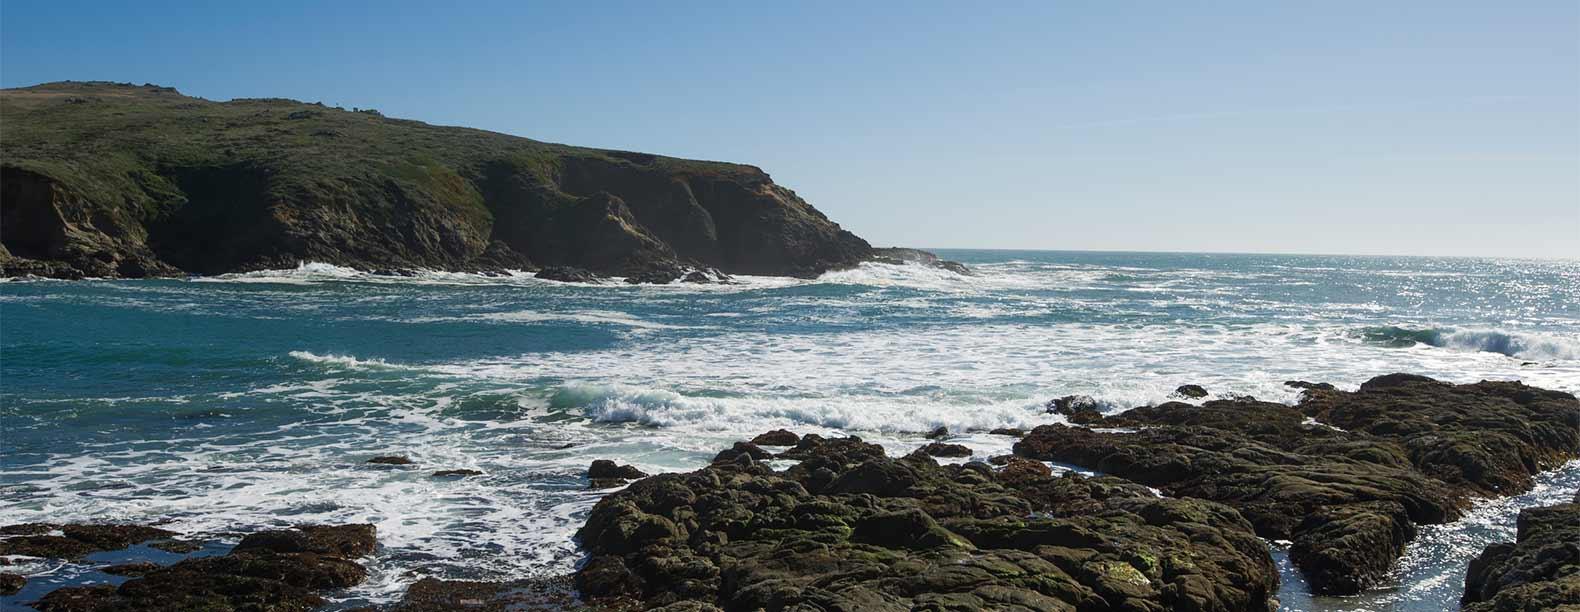 bodega-marine-reserve